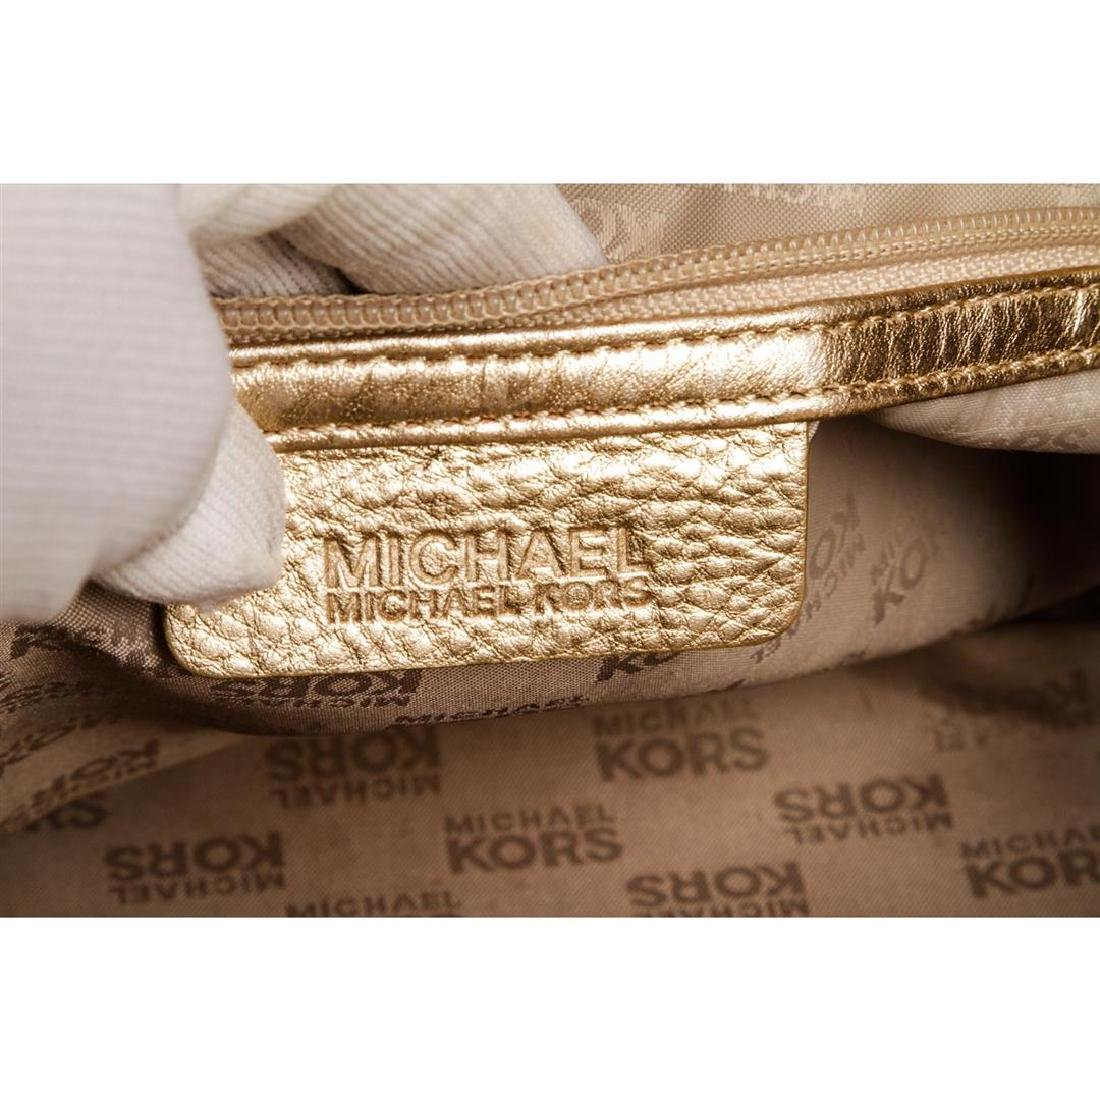 Michael Kors Pale Gold Leather Berkley Clutch Handbag - 6